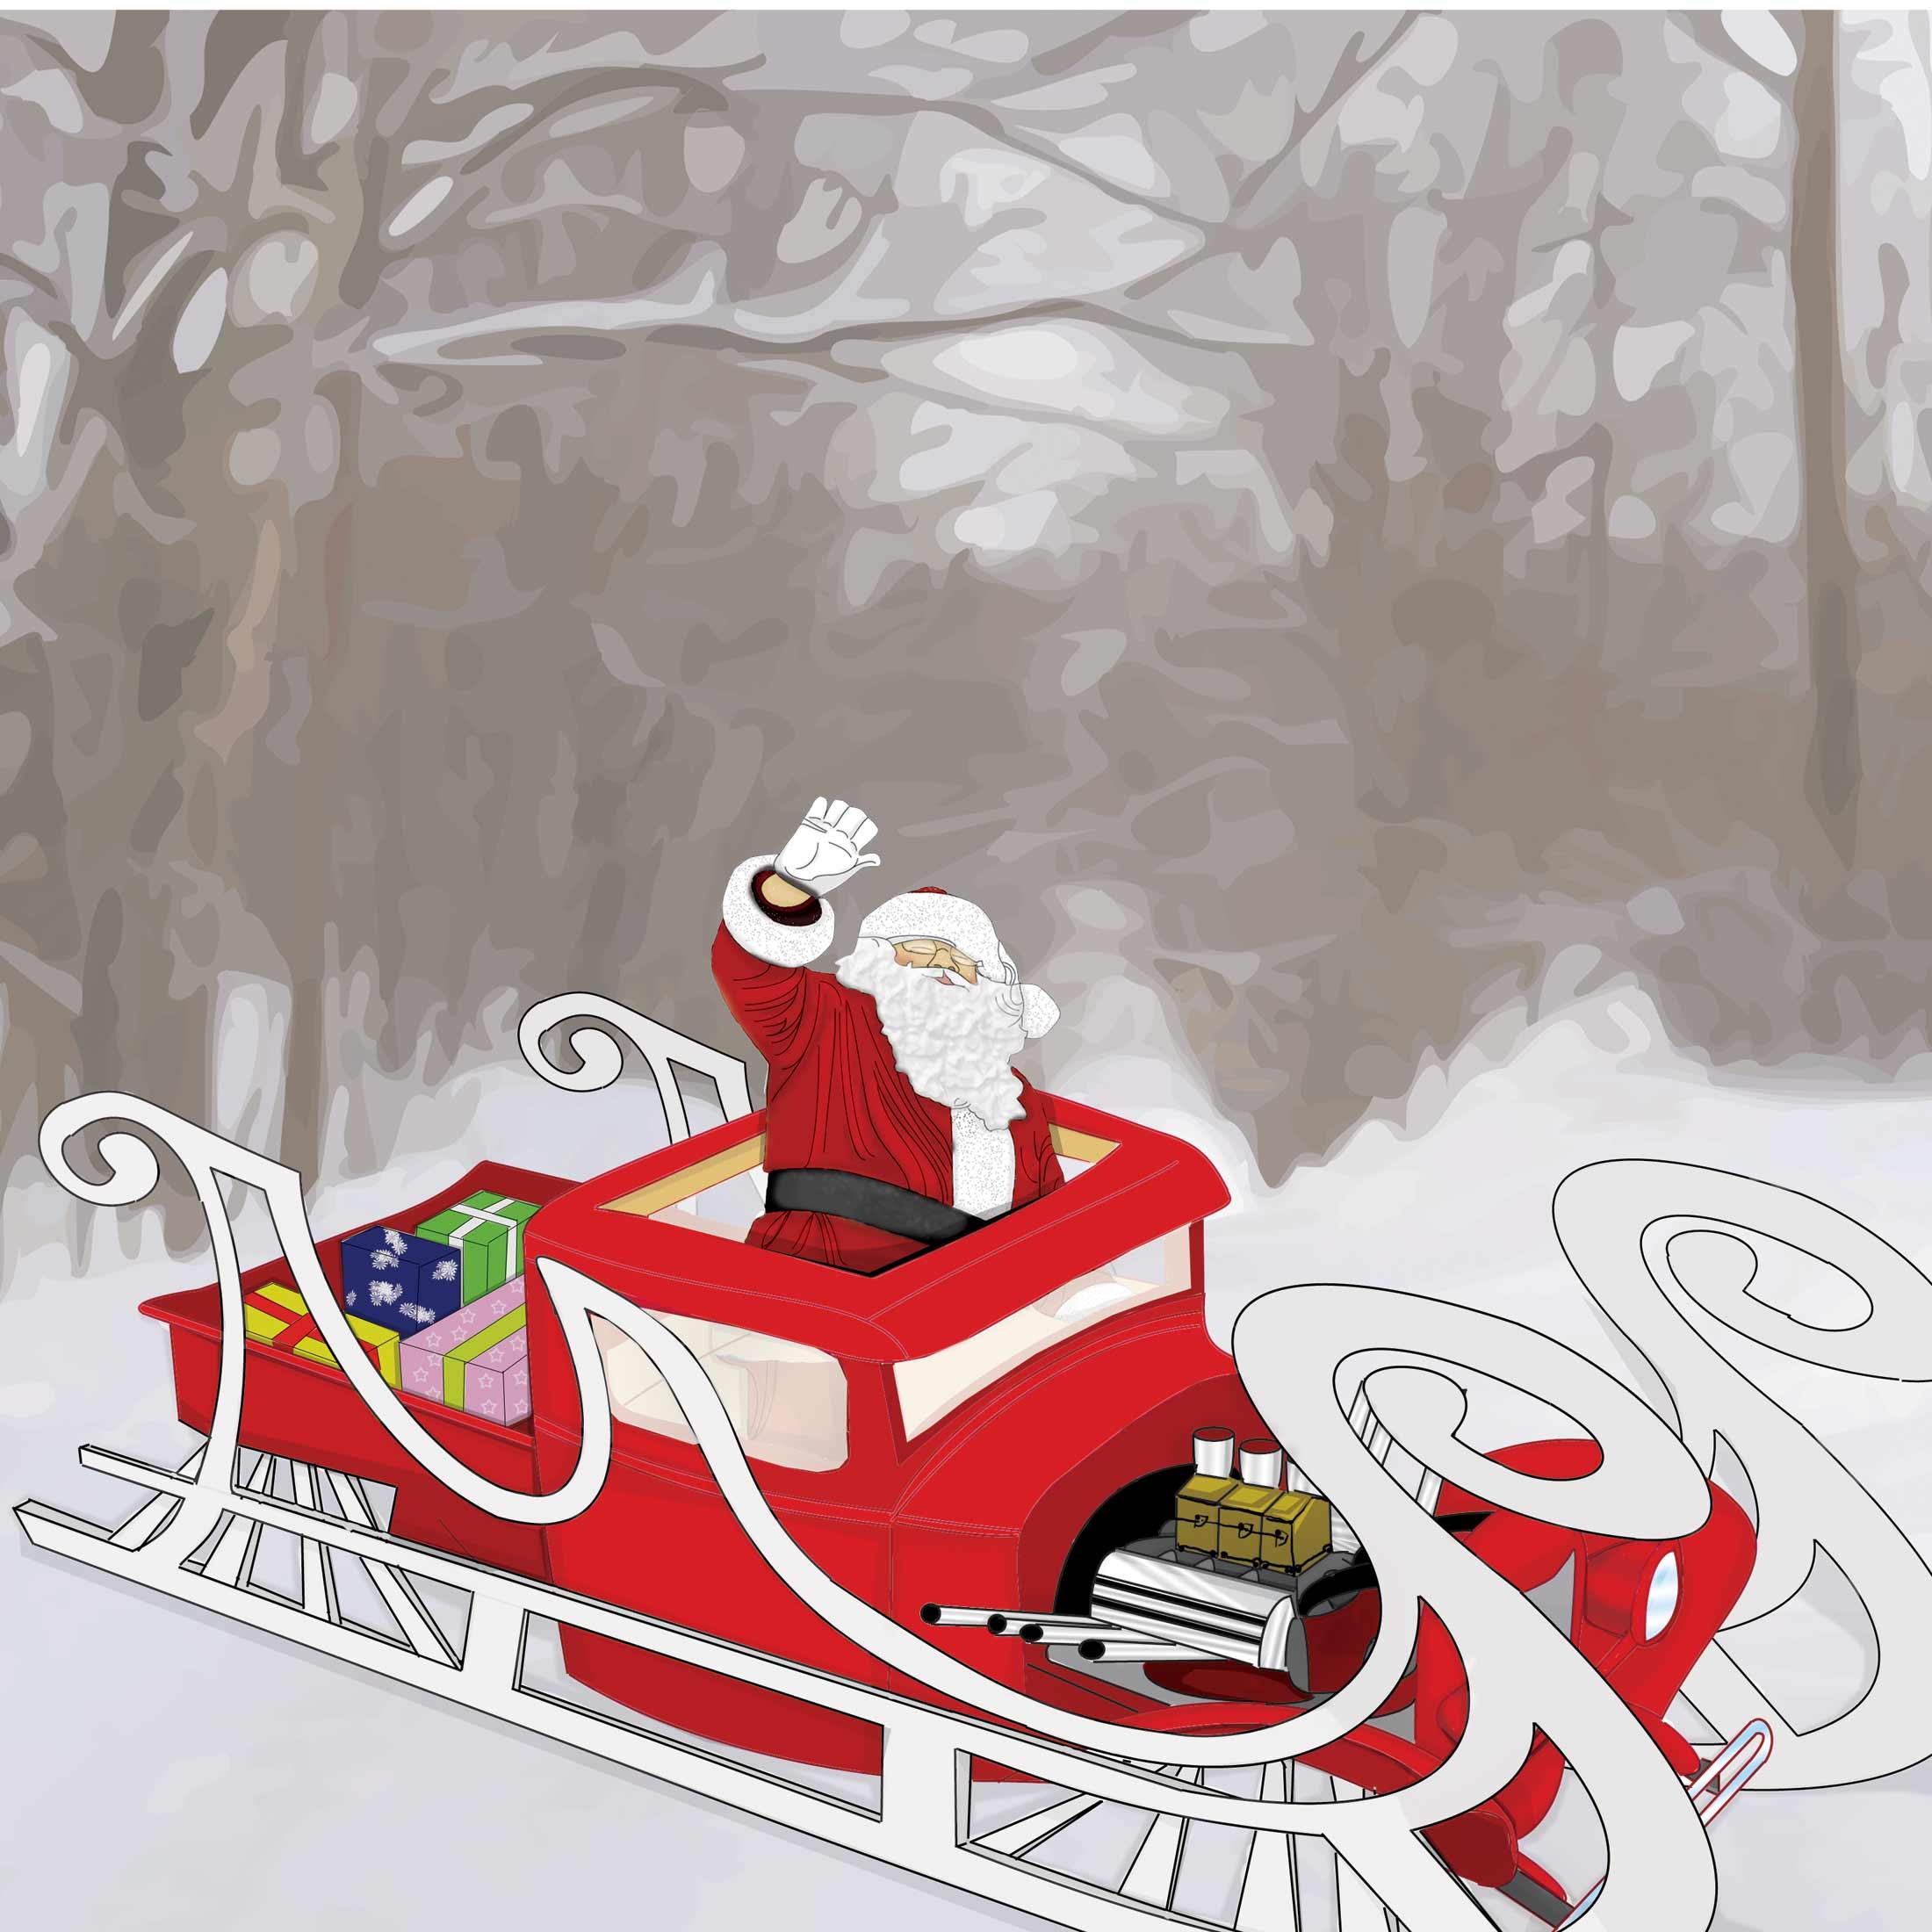 Click image for larger version  Name:Santa_truck_lo.jpg Views:138 Size:251.8 KB ID:35215